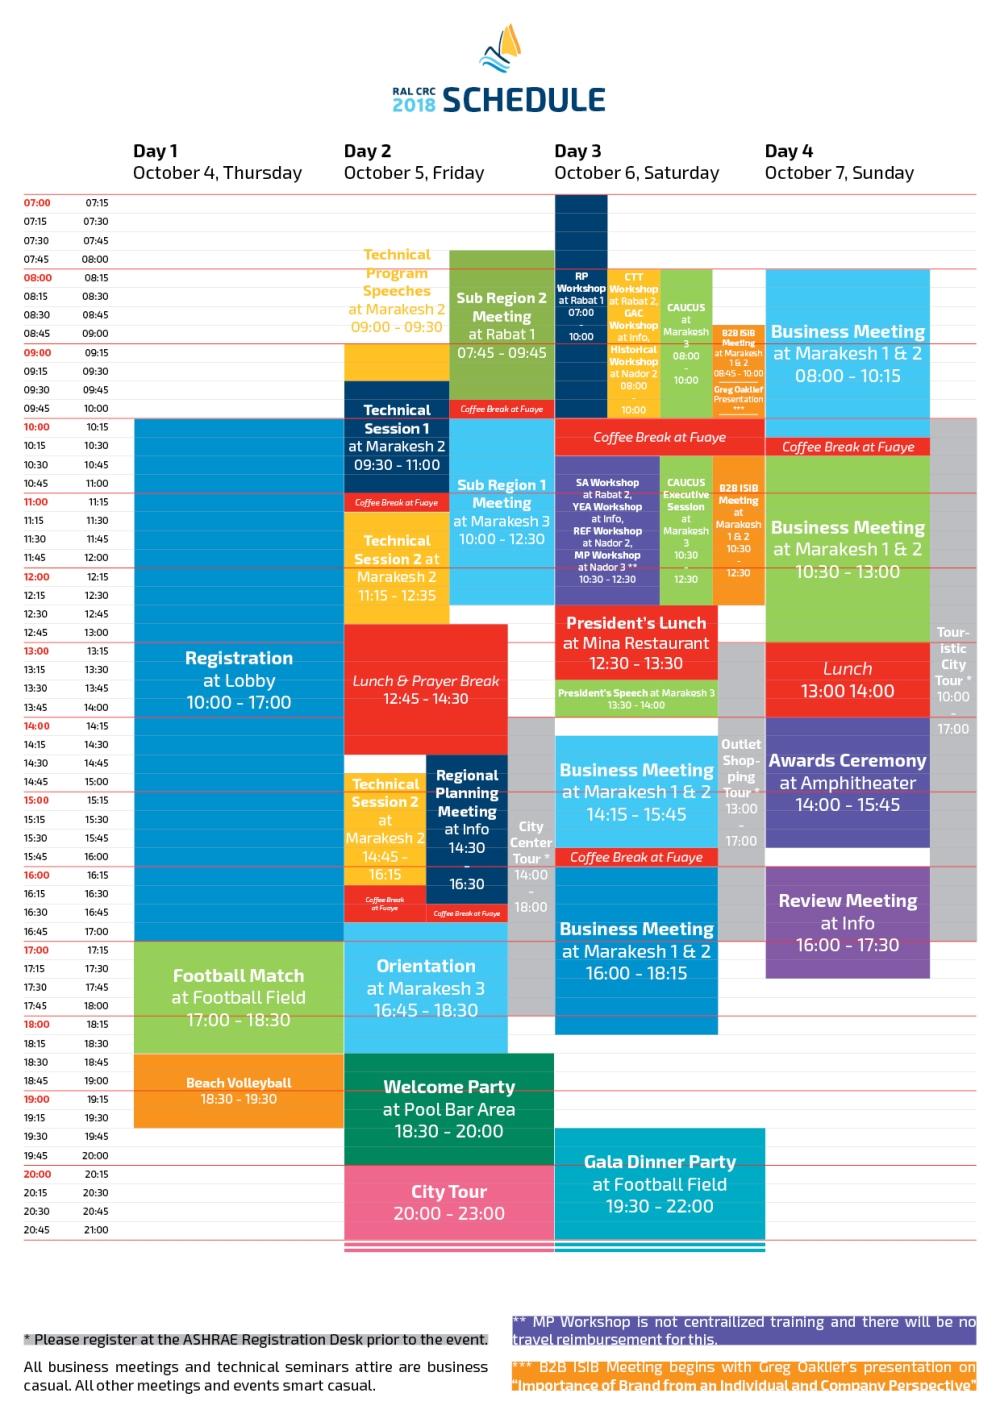 RALCRC2018_Schedule_Leaflet